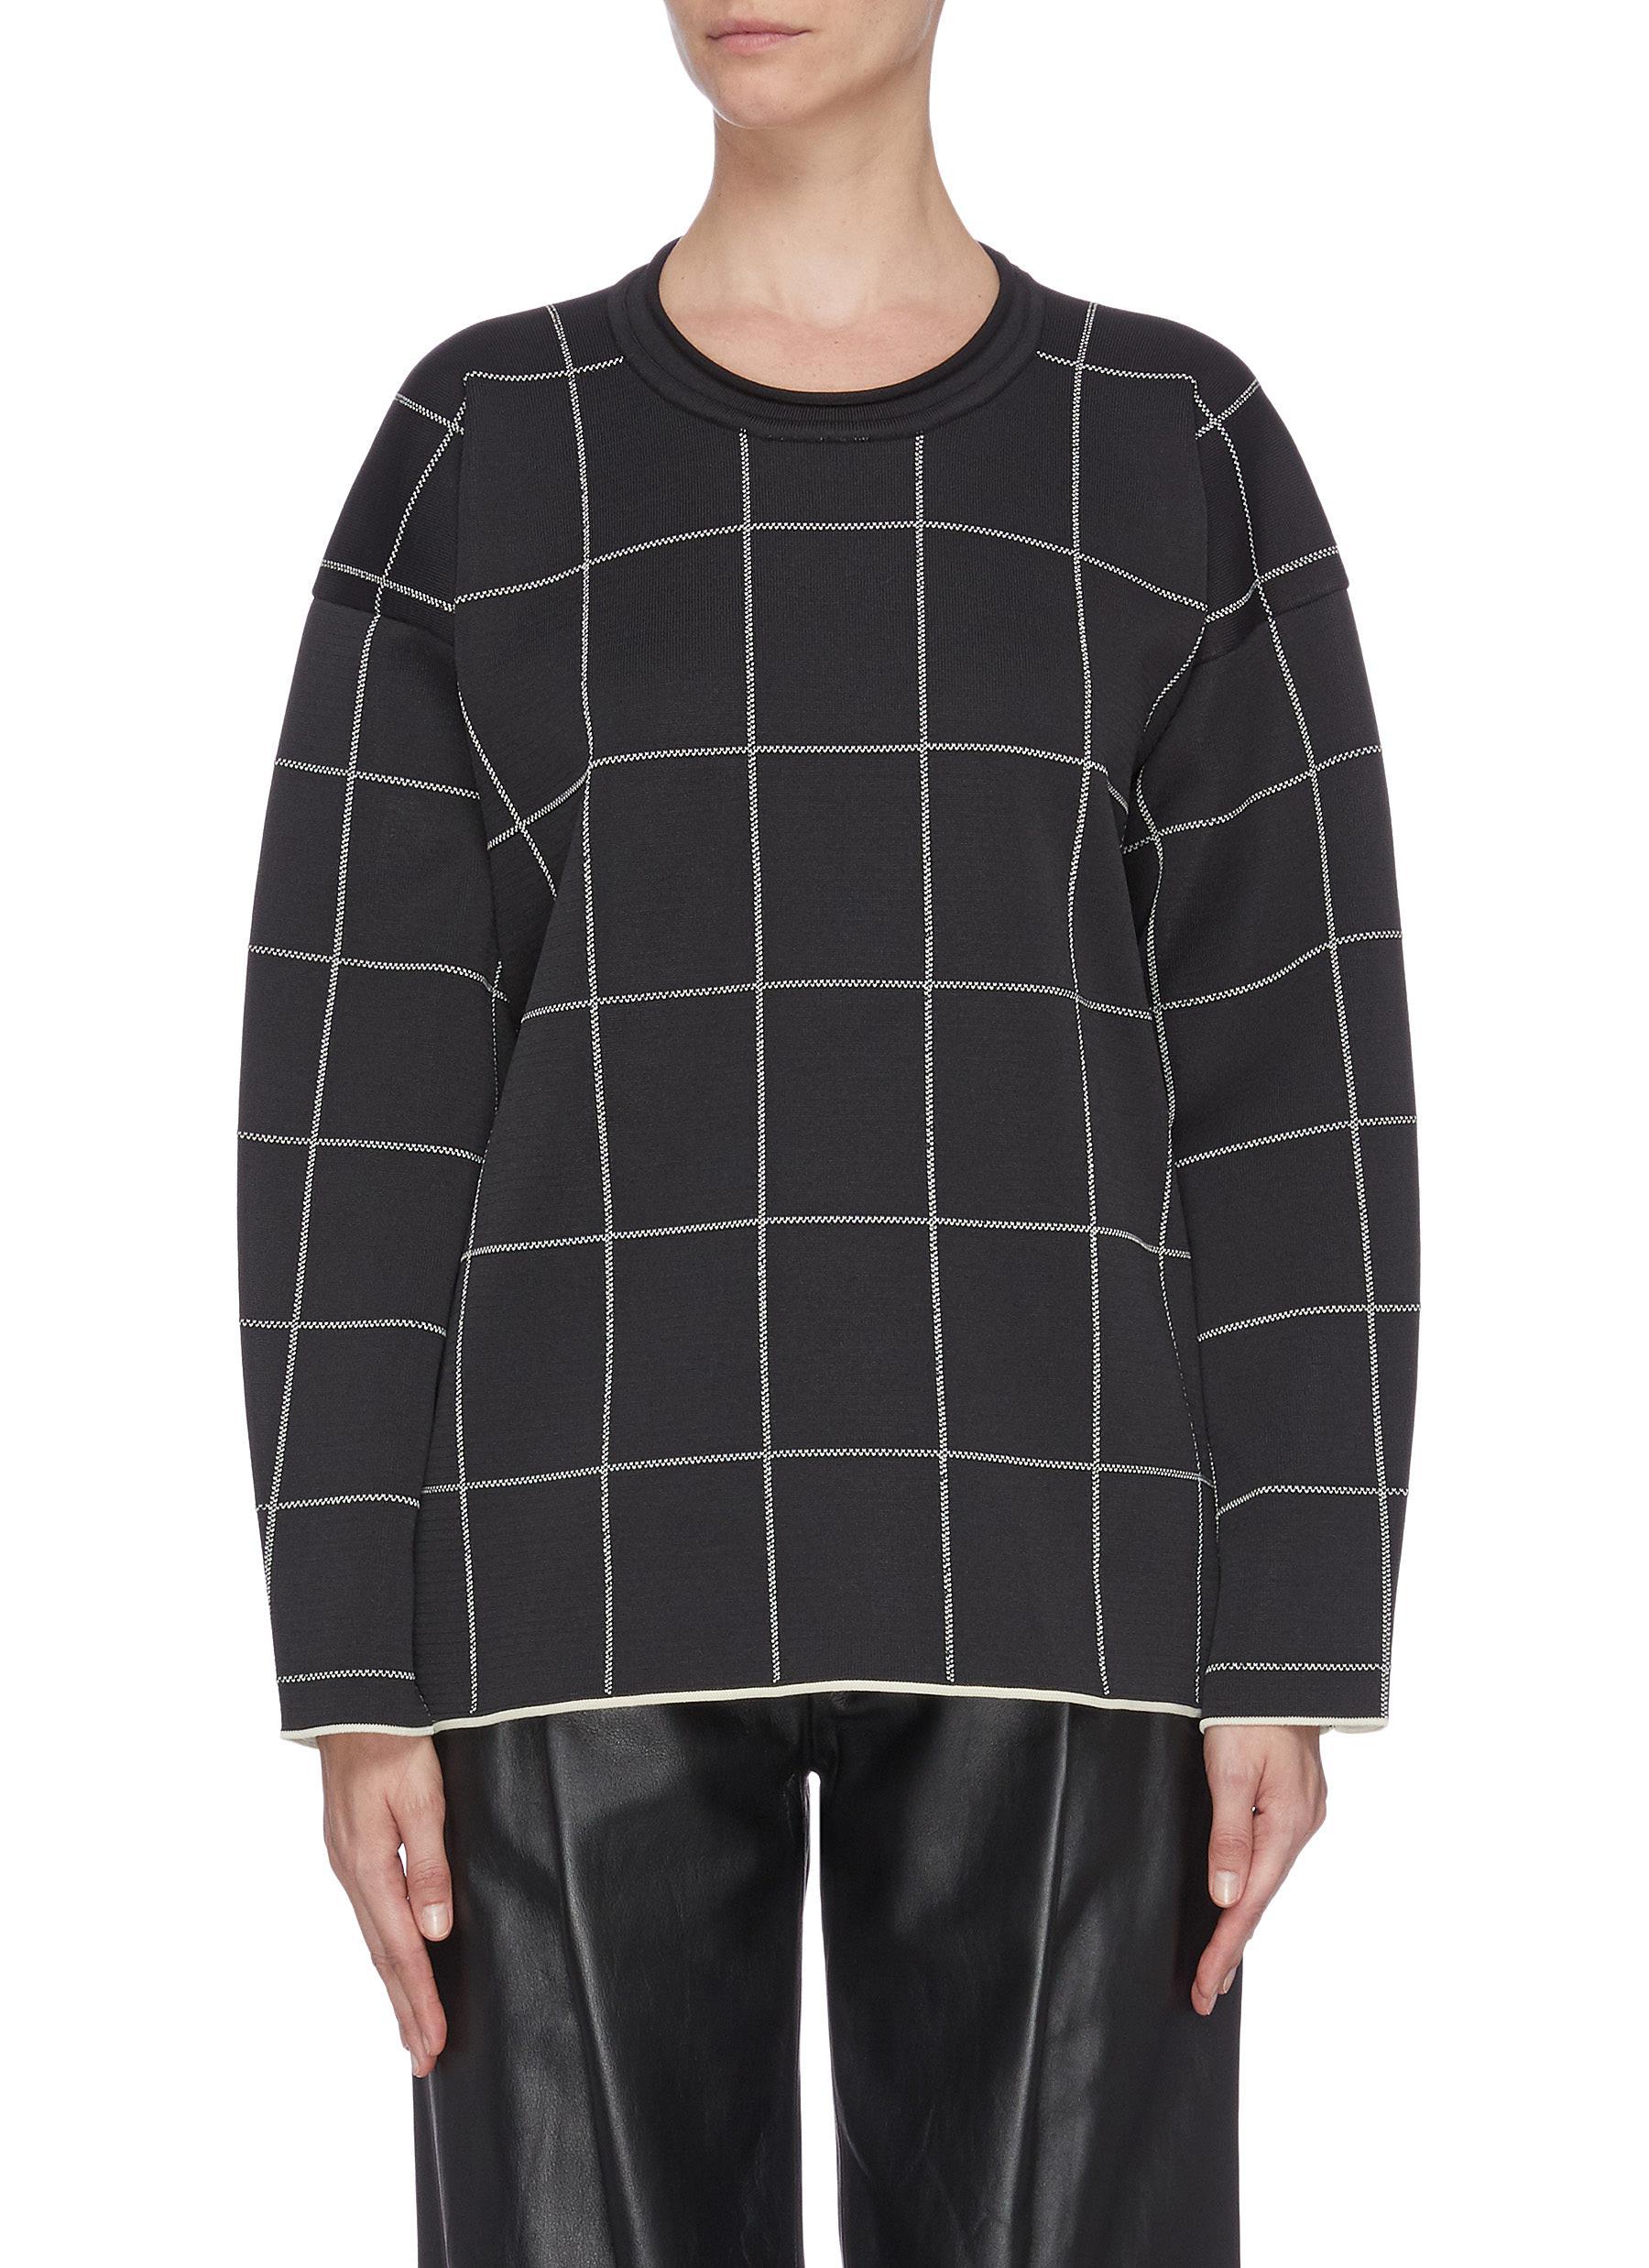 Buy 3.1 Phillip Lim Tops Window pane check sweatshirt